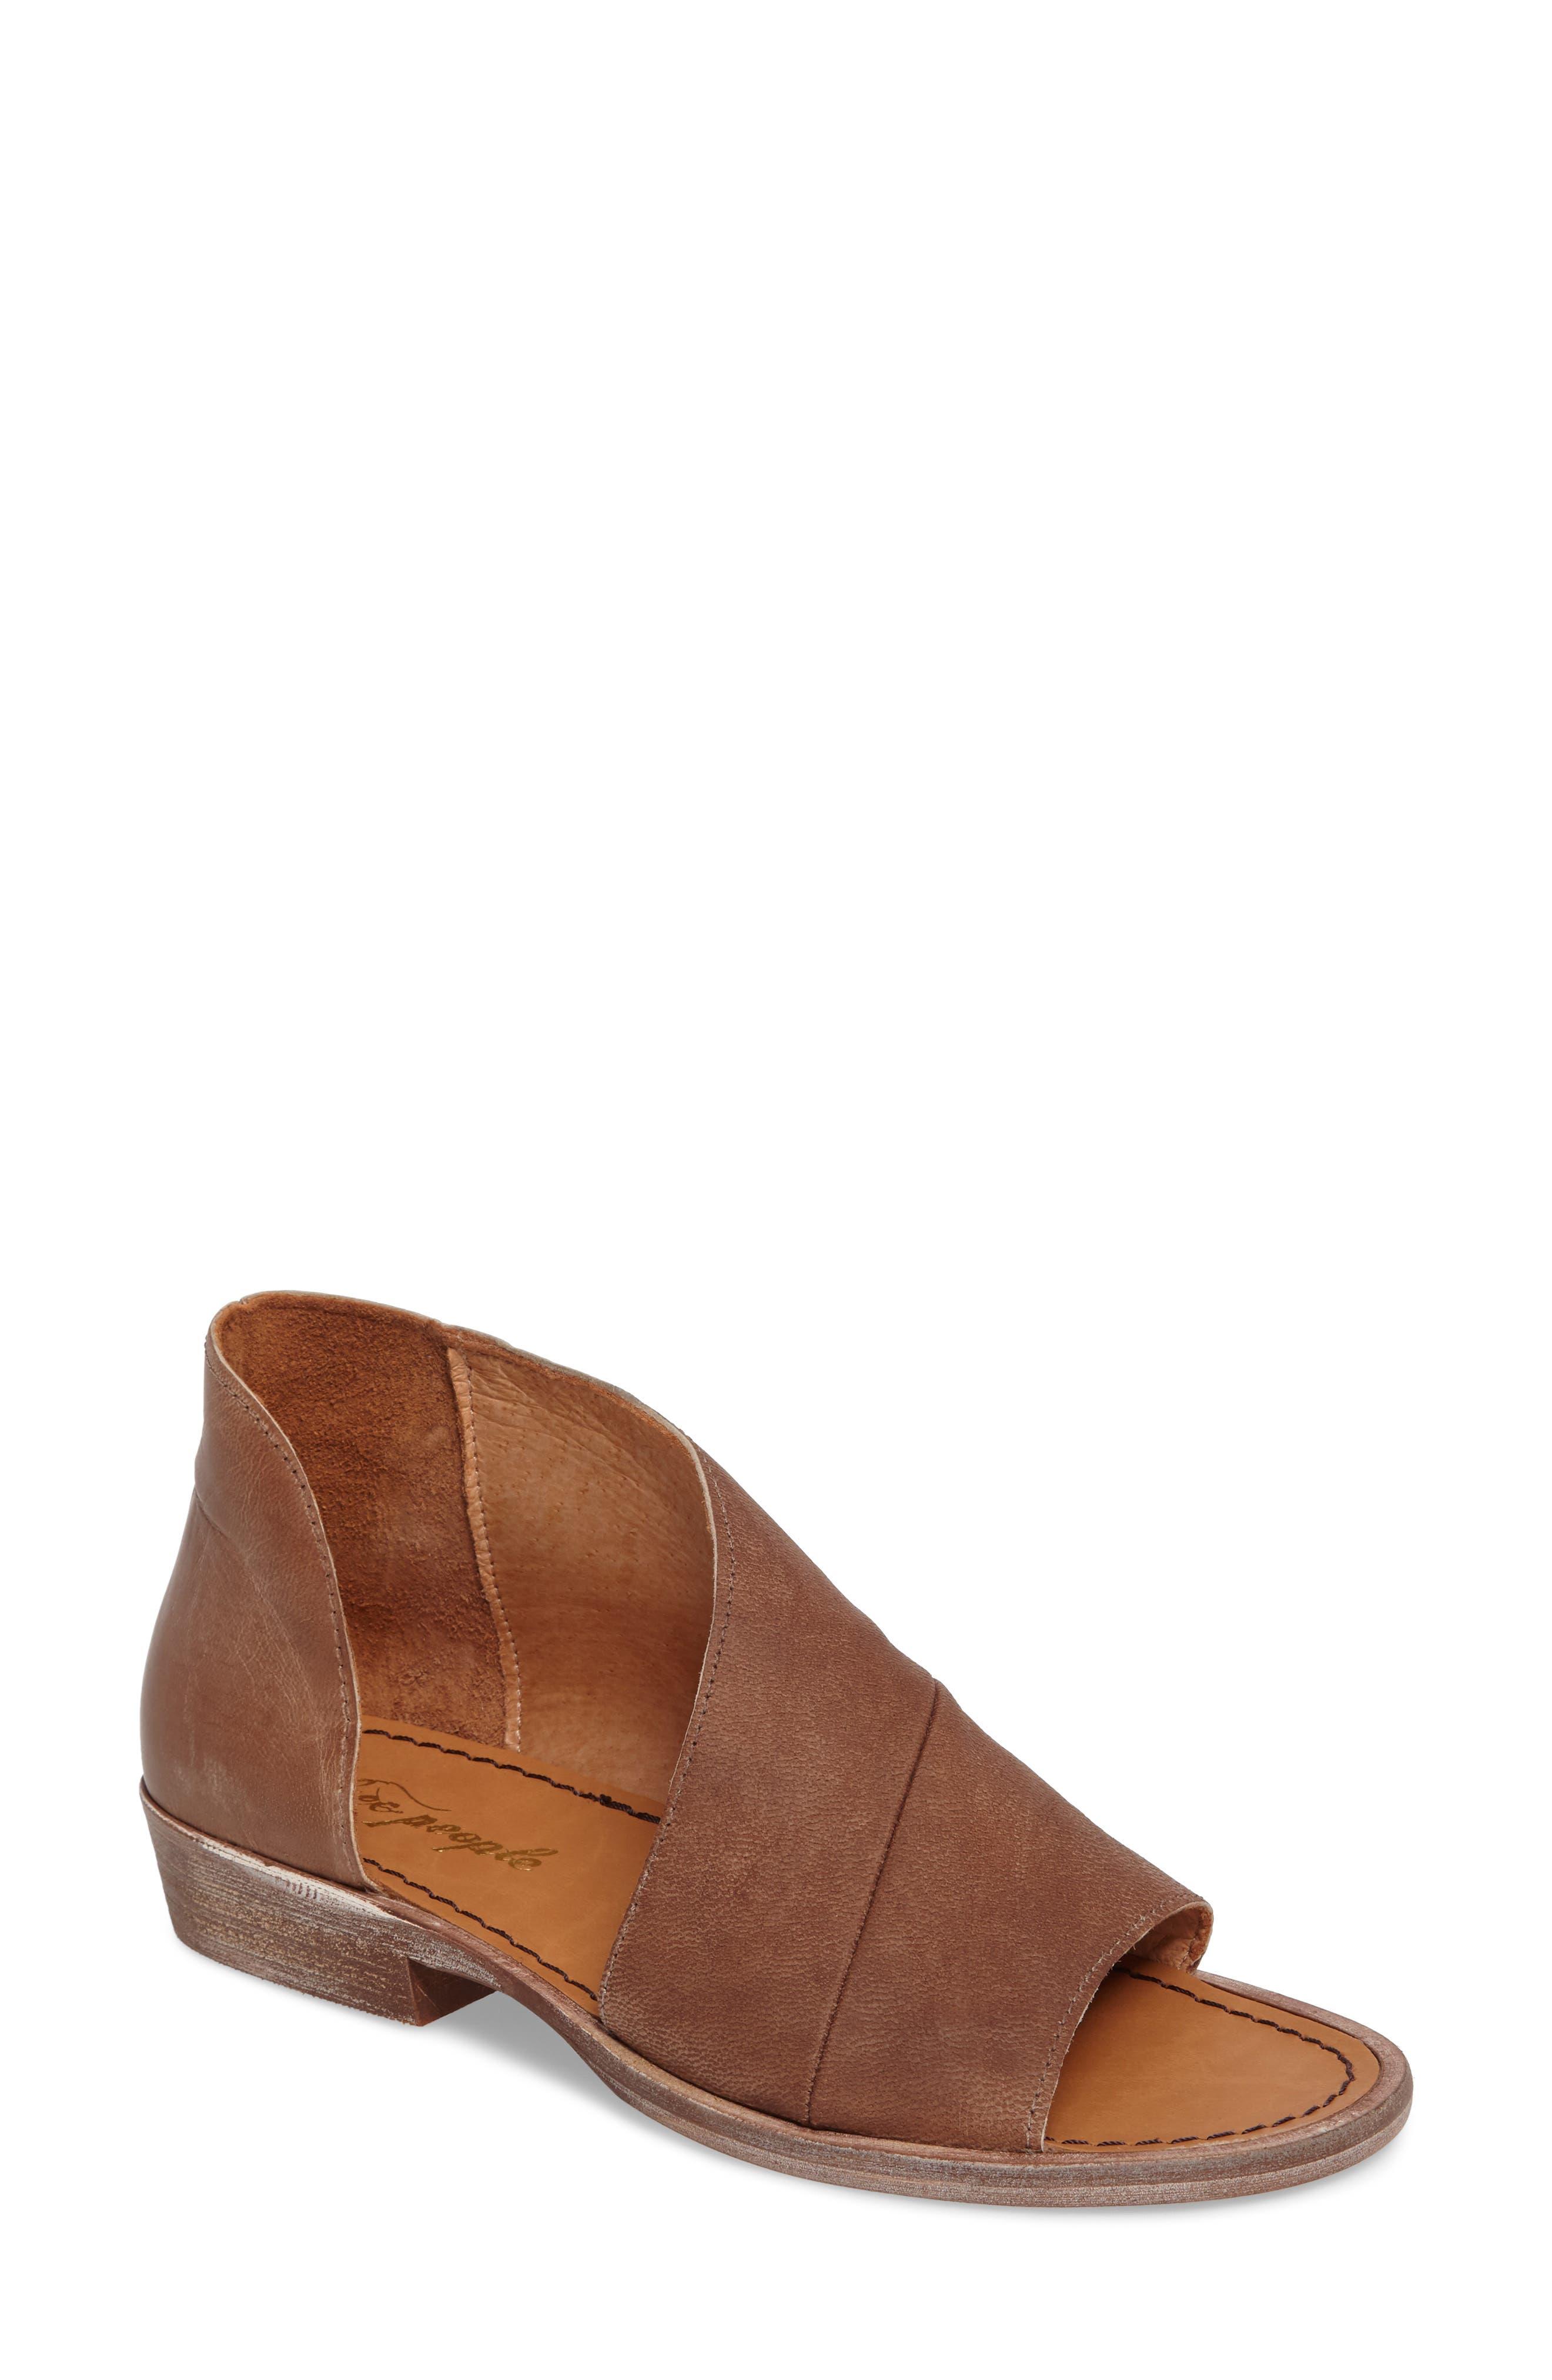 'Mont Blanc' Asymmetrical Sandal,                             Main thumbnail 11, color,